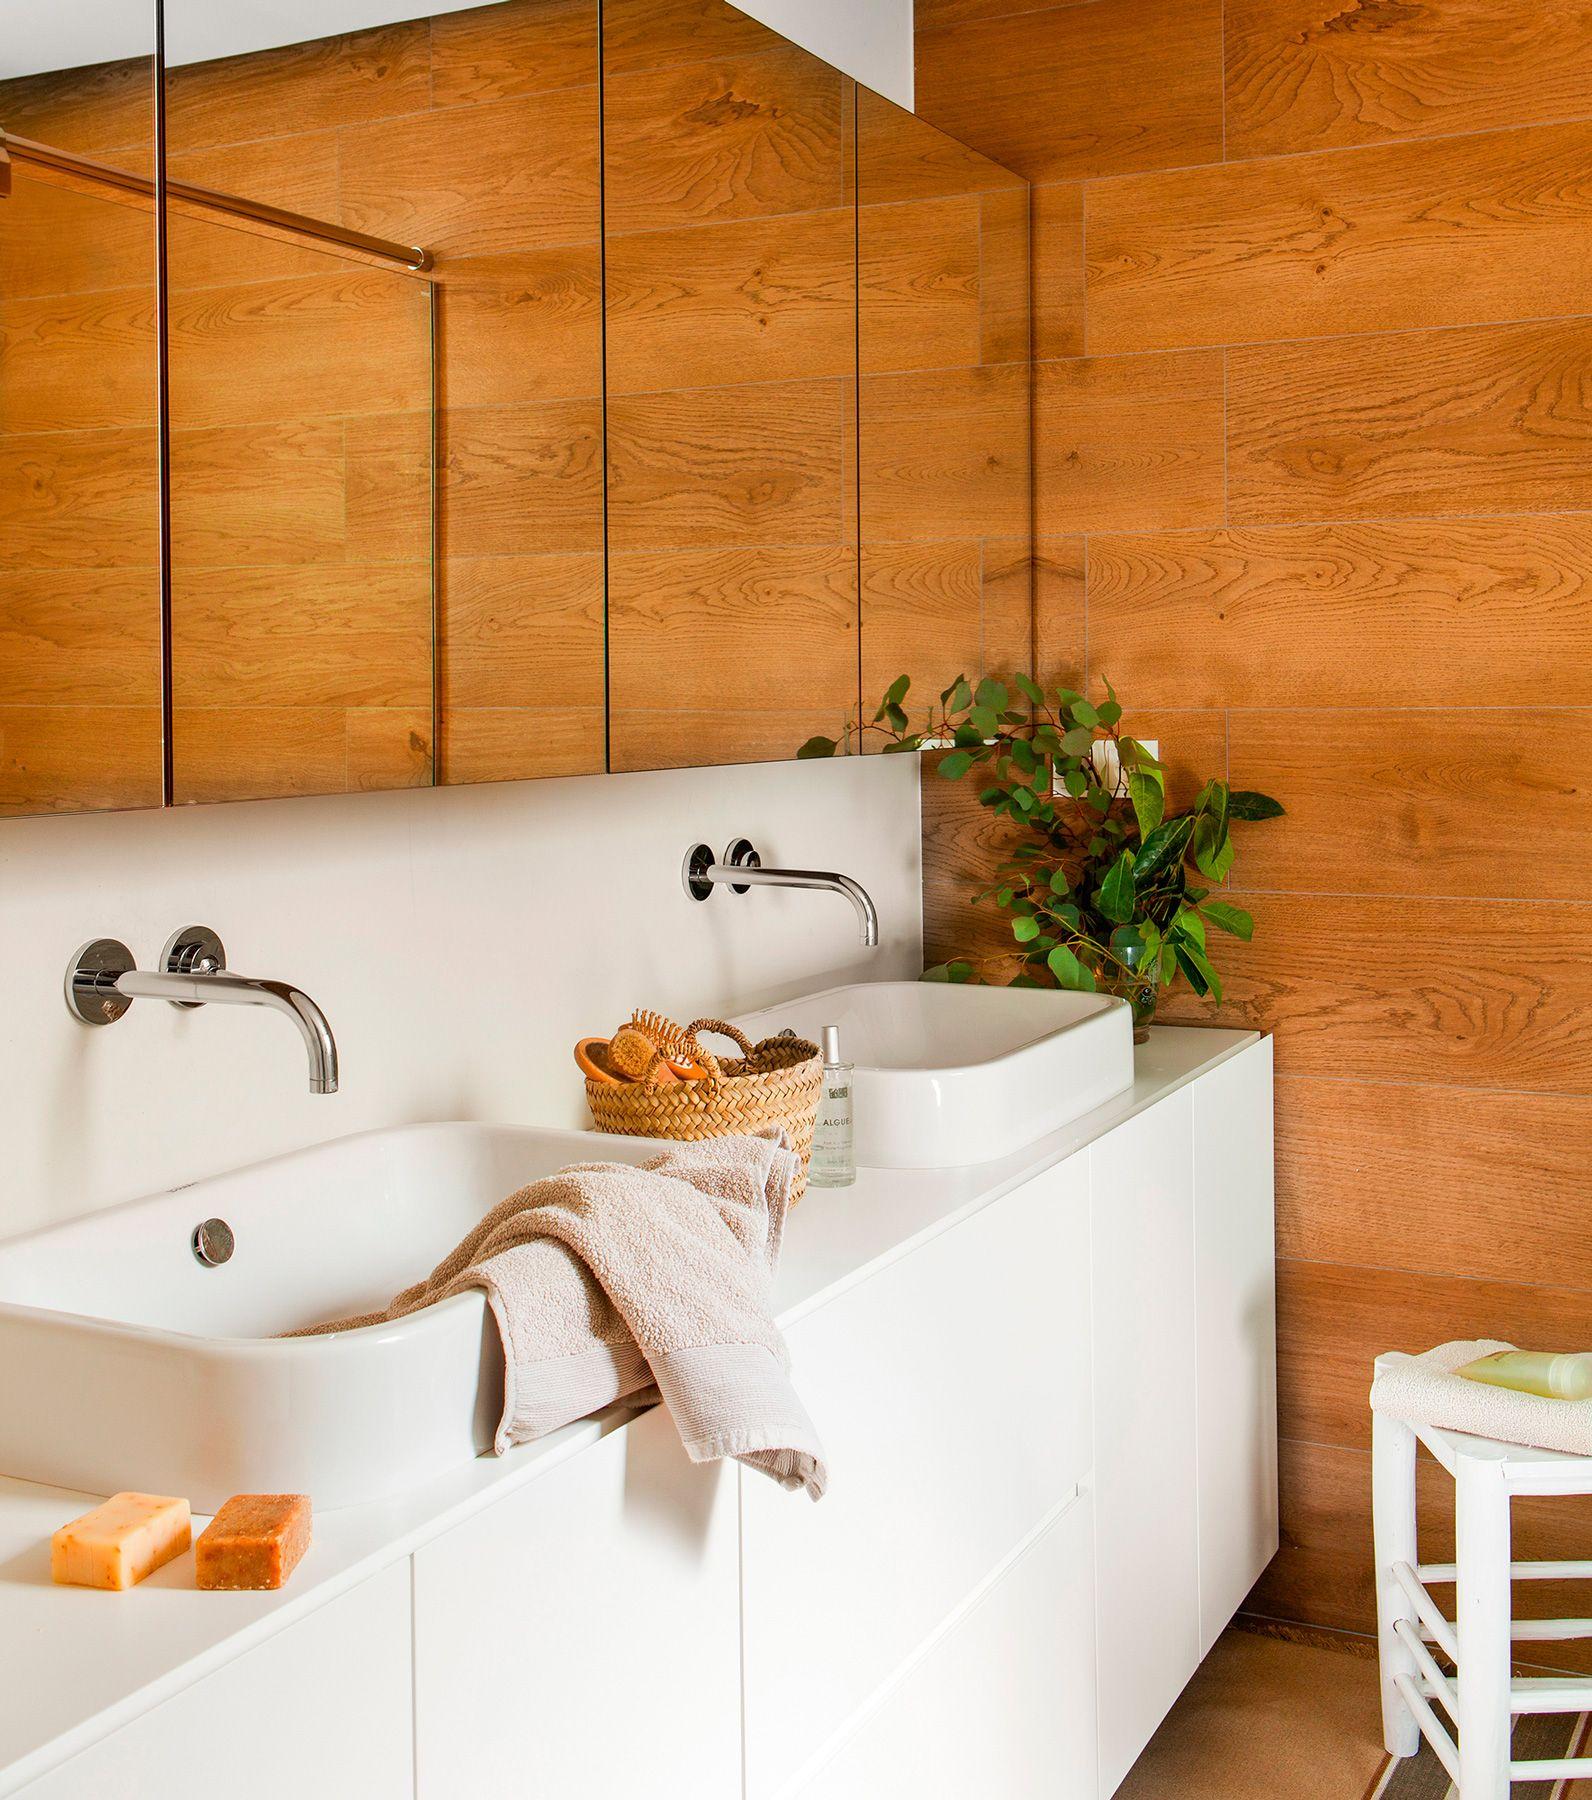 Ba o con lavamanos de doble seno de duravit mueble a for Revestimiento bano moderno